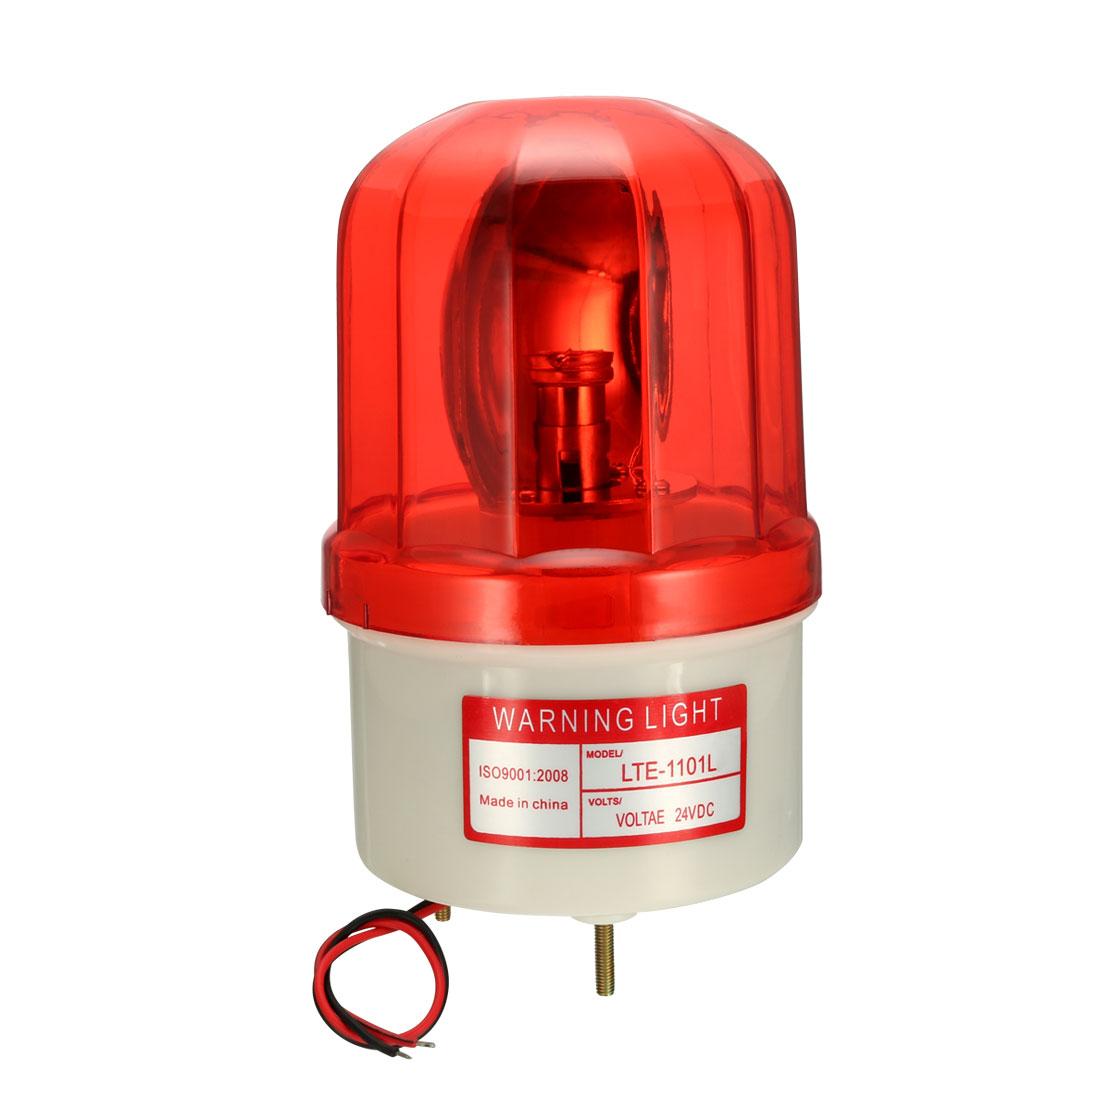 LED Warning Light Bulb Rotating Signal Tower Lamp DC 24V Red LTE1101L